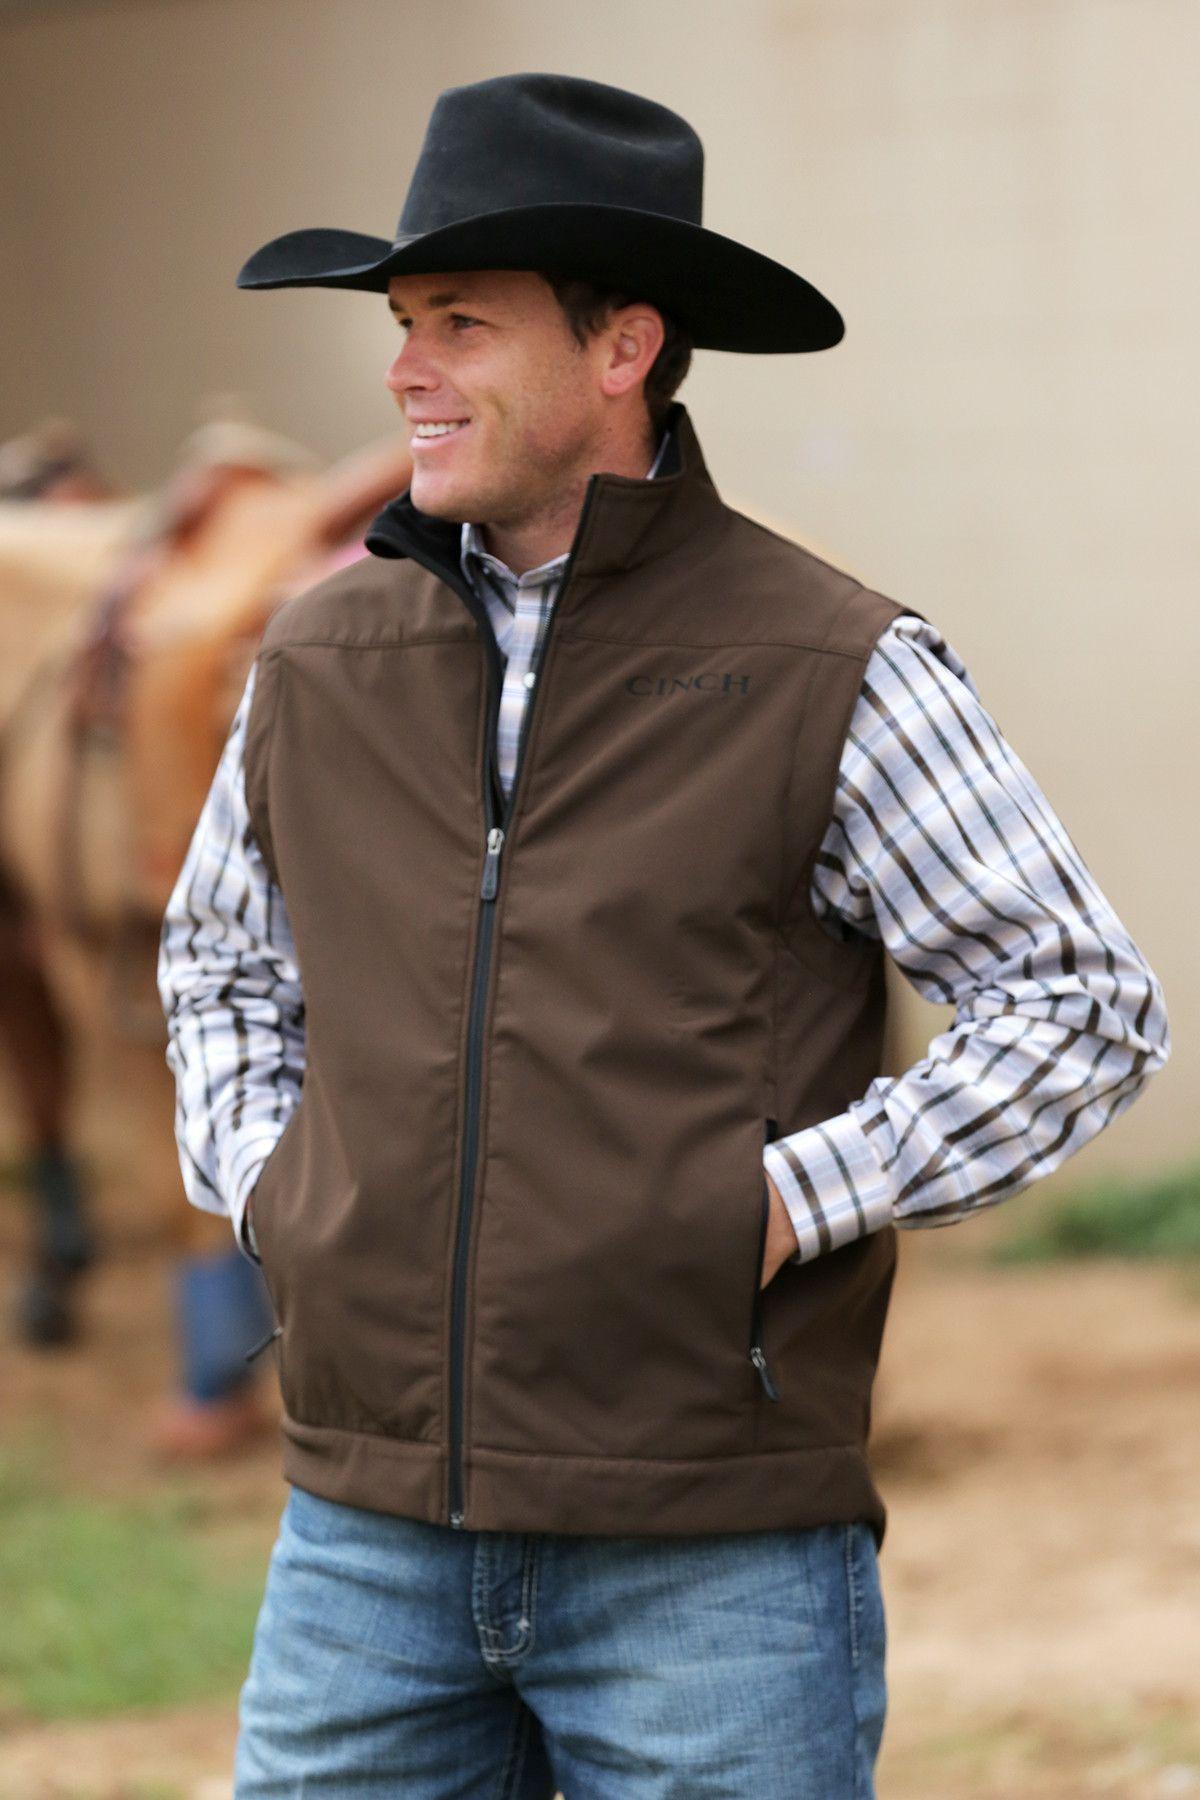 Cinch Men S Bonded Conceal Carry Zip Up Pocket Brown Western Vest Mwv1058001 Mwv105801x Mens Vest Fashion Mens Western Wear Mens Hats Fashion [ 1800 x 1200 Pixel ]